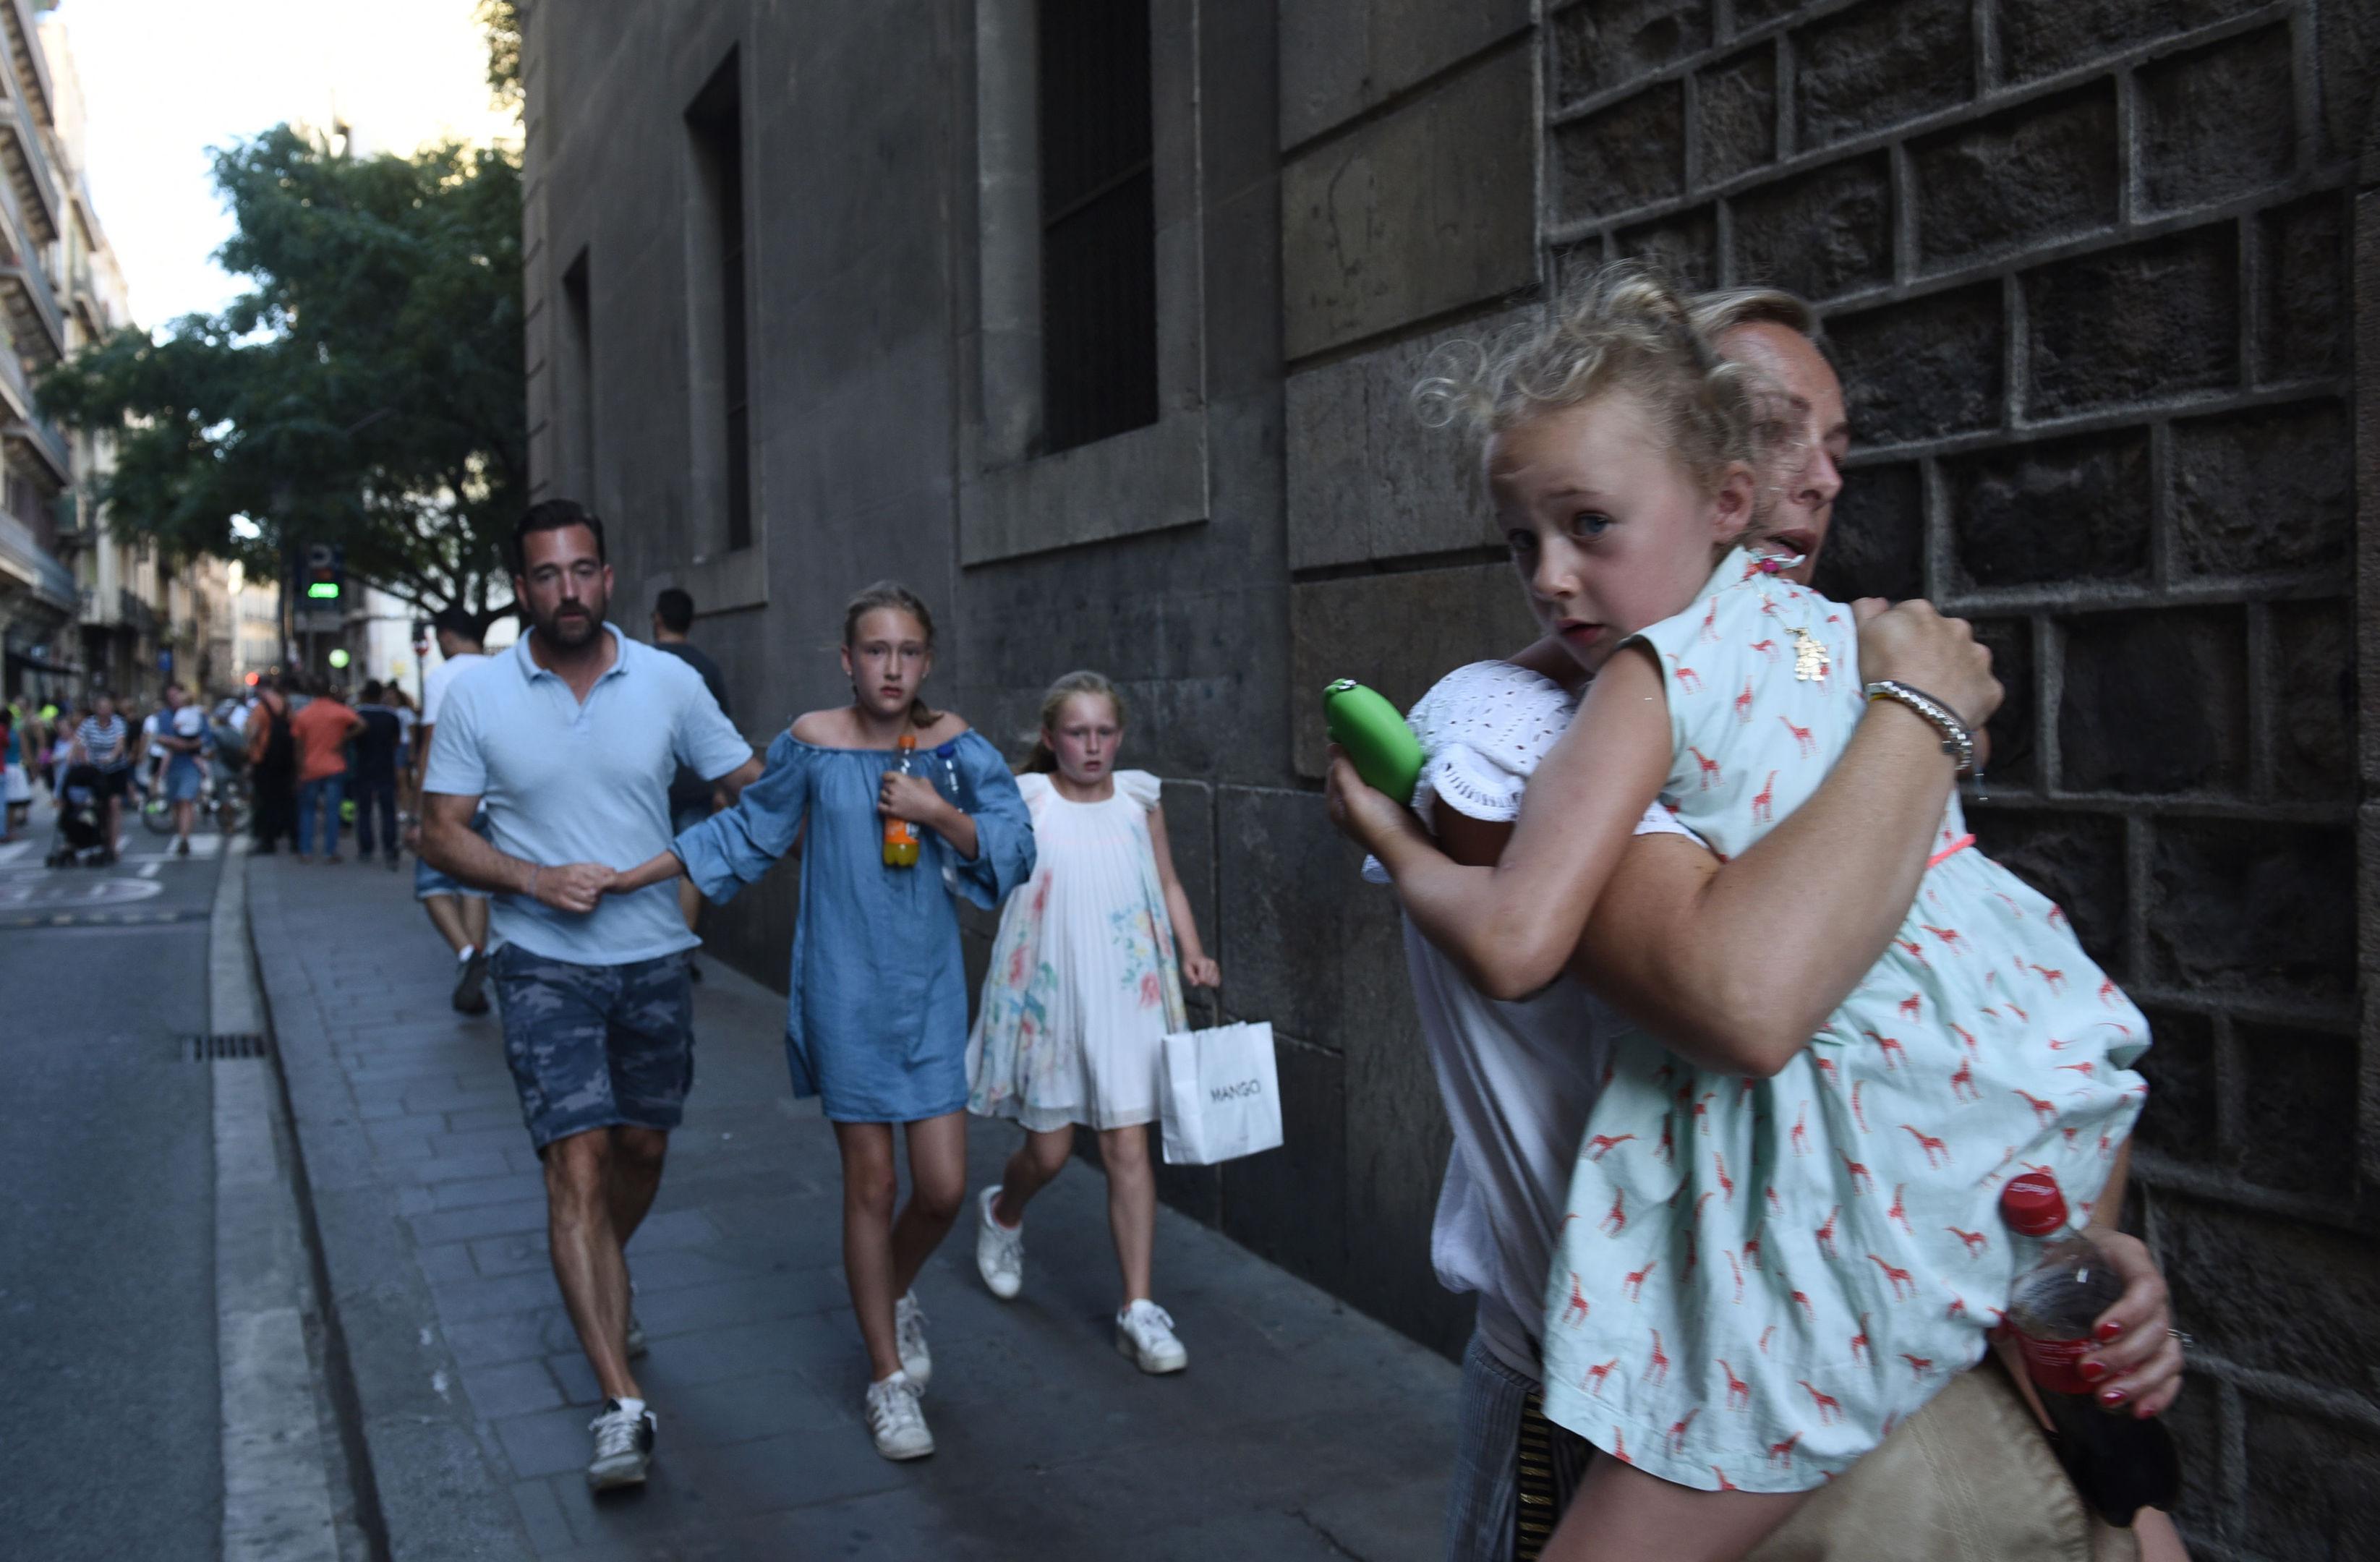 People flee the scene in Barcelona, Spain.